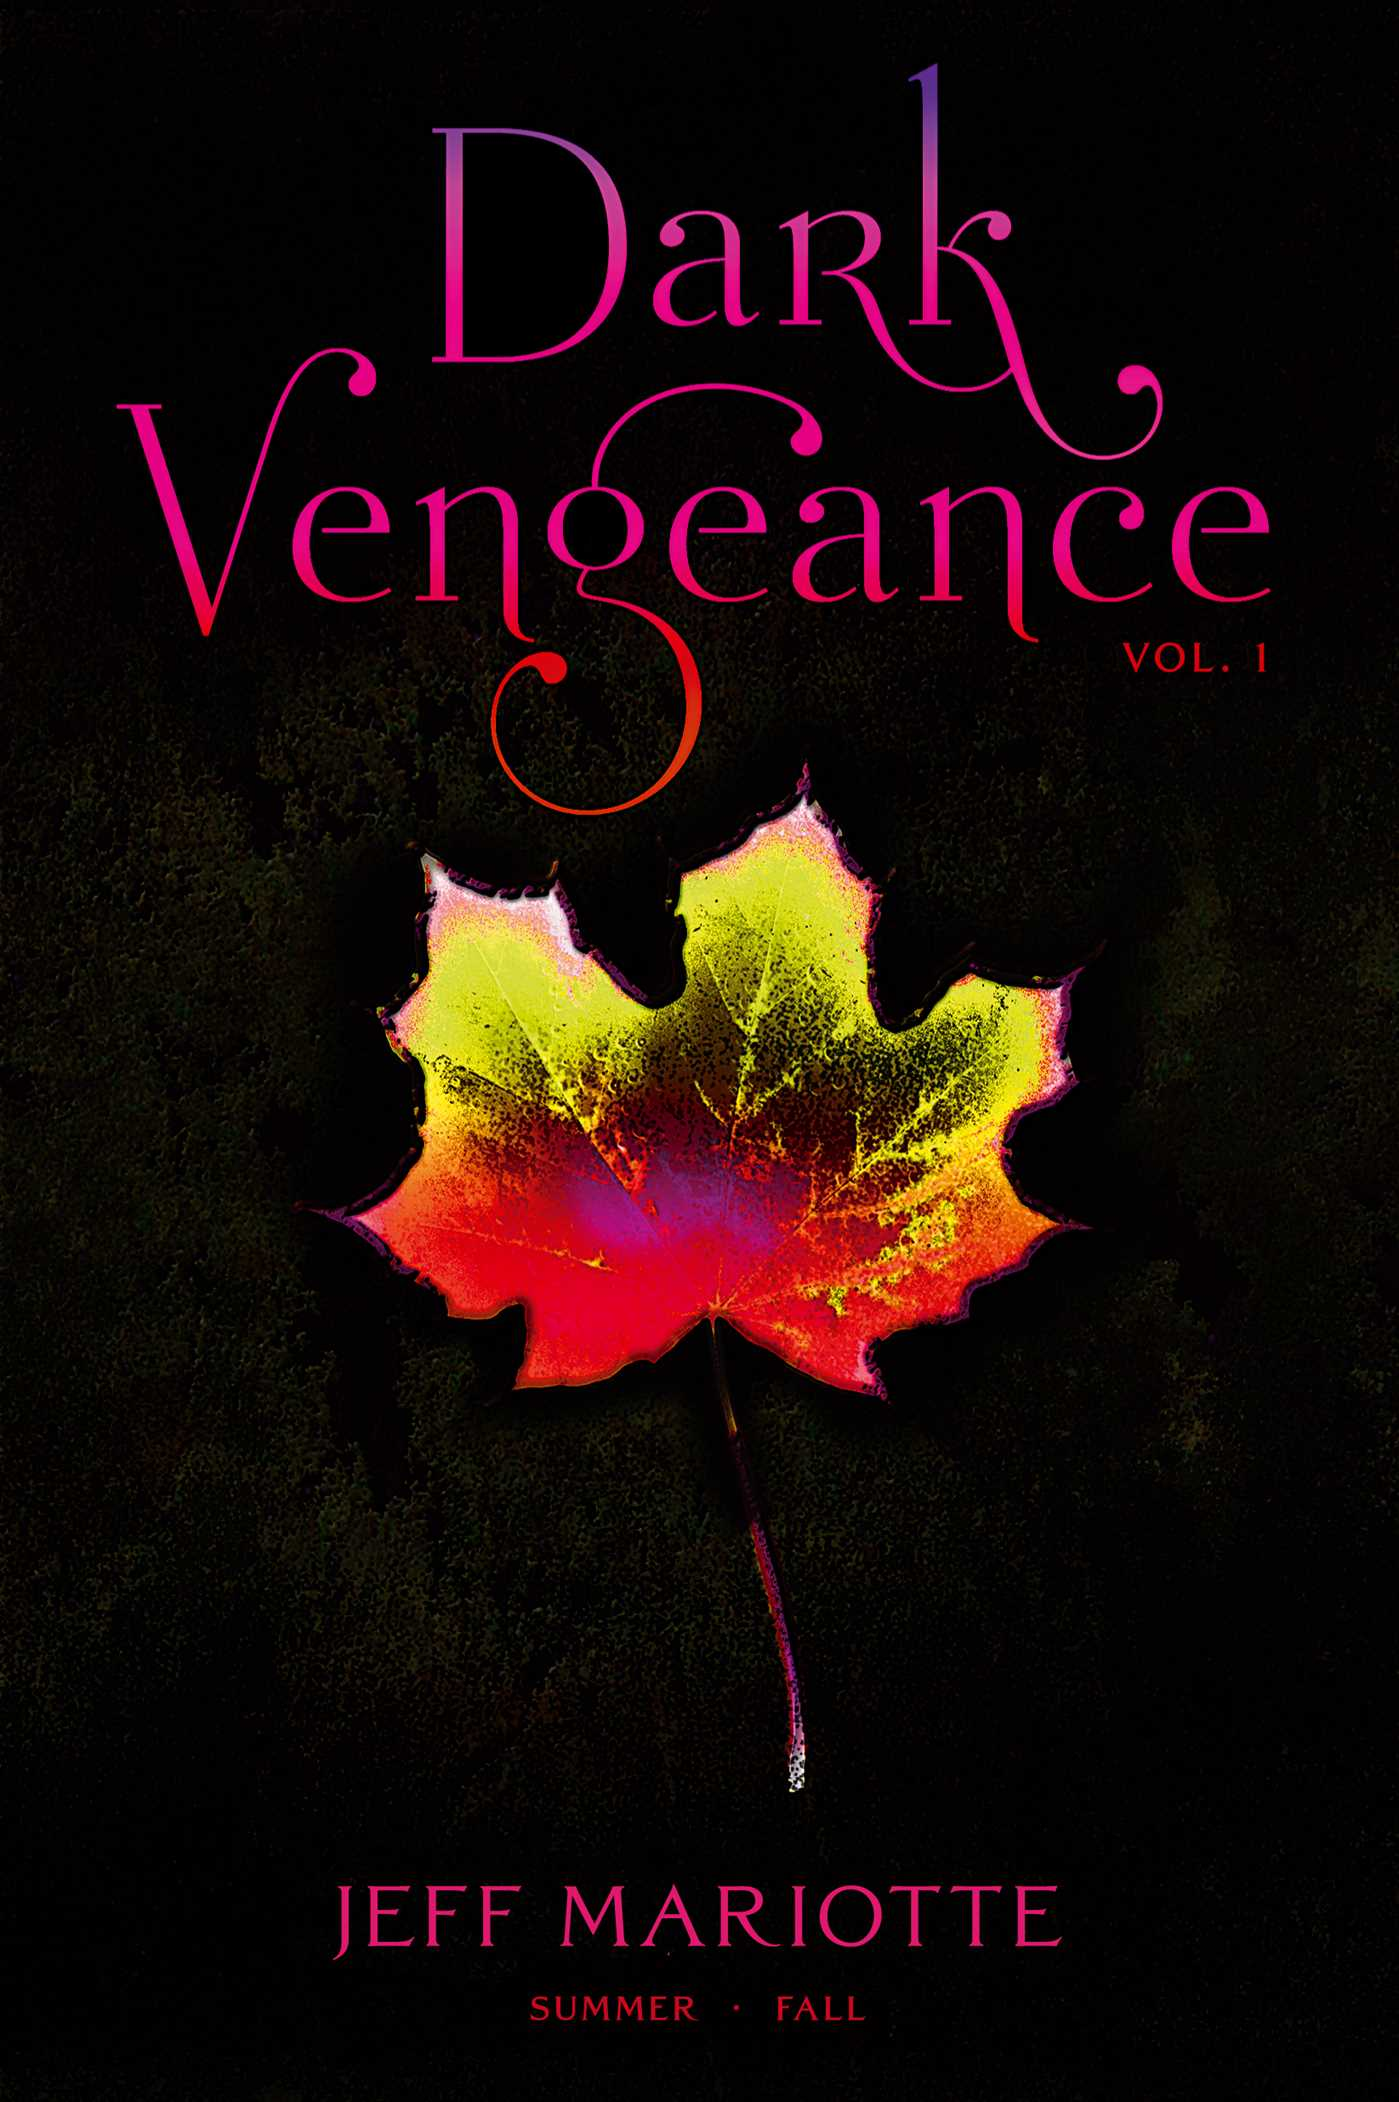 Dark vengeance vol 1 9781442436251 hr